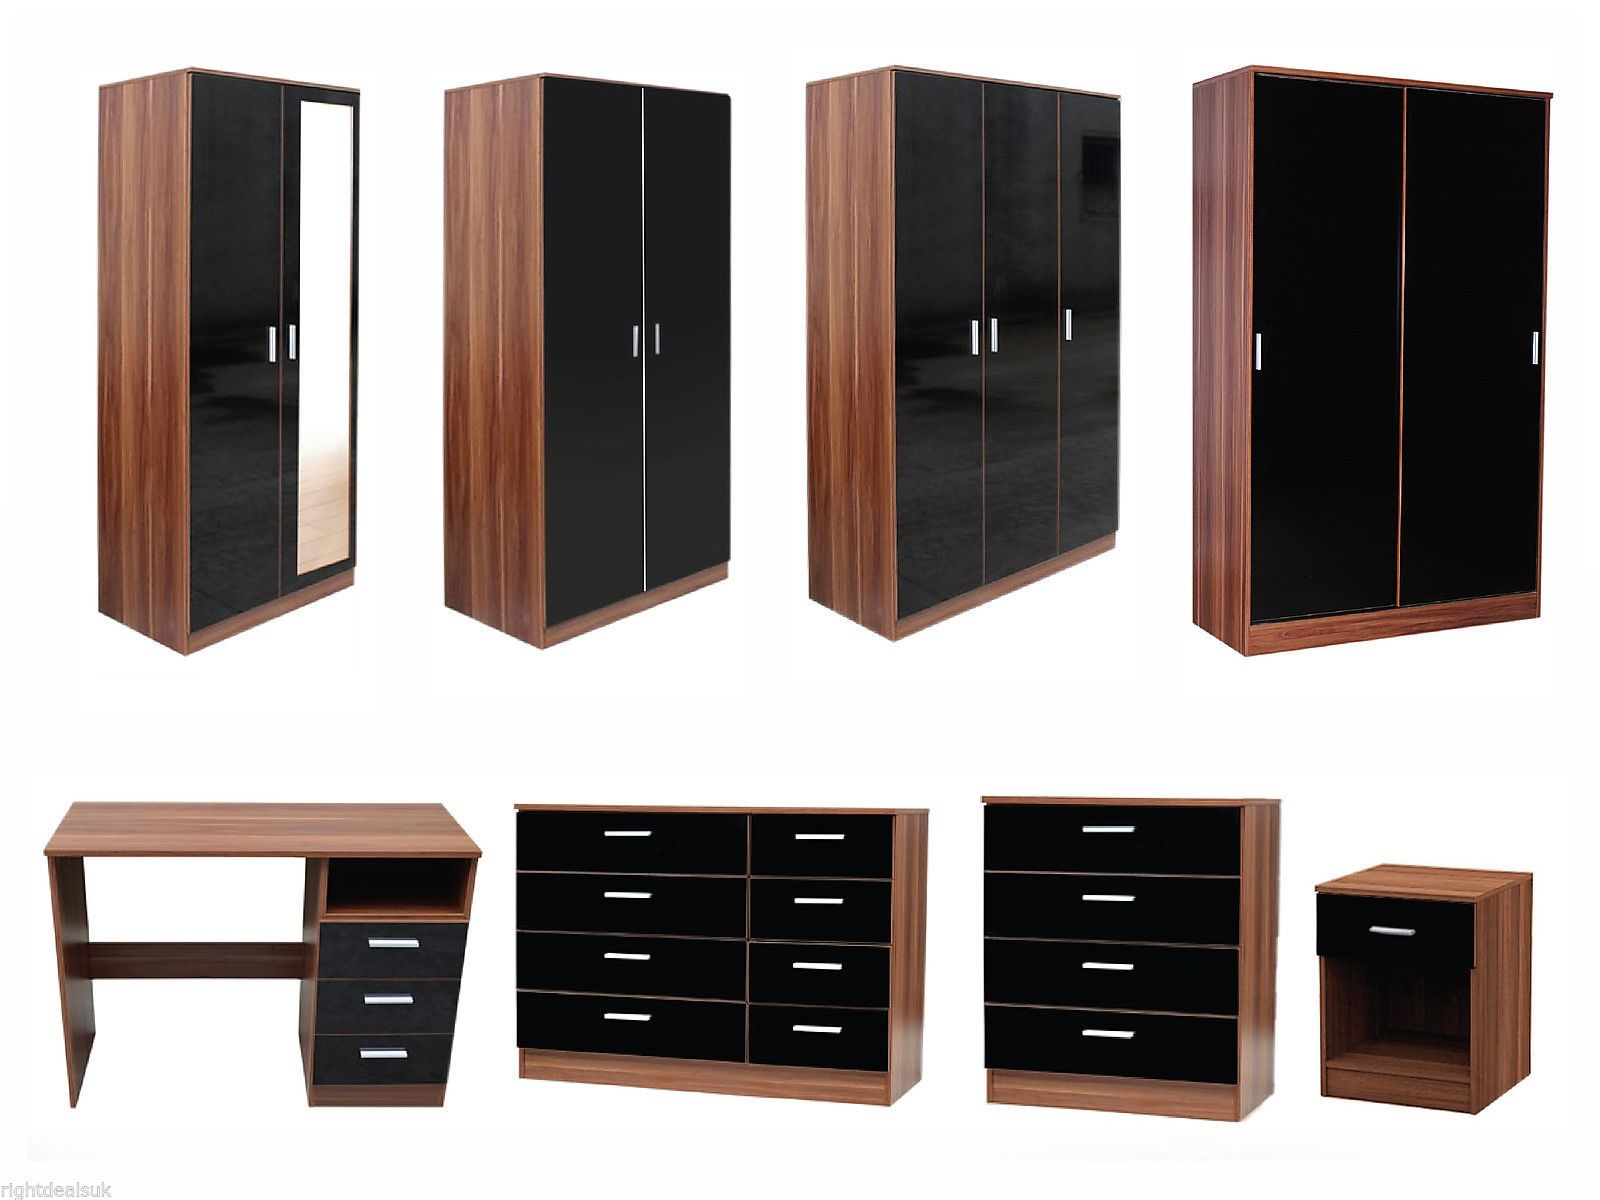 Caspian high gloss bedroom furniture sets bedroom furniture